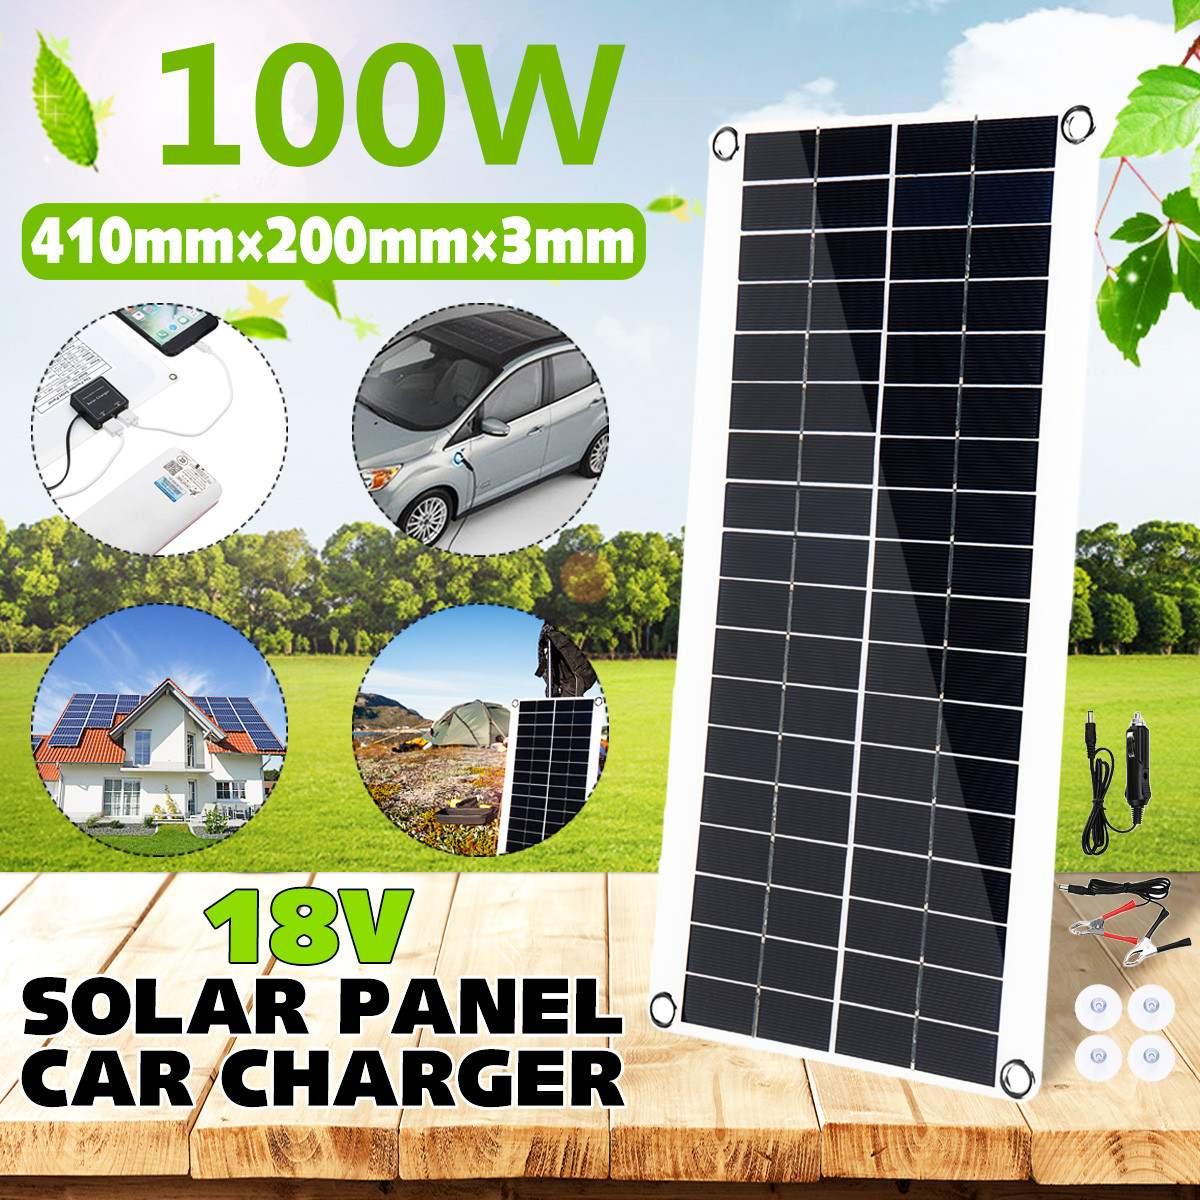 100W Tragbare Solar Panel Doppel USB Power Bank Bord Externe Batterie Lade Auto Ladegerät Solarzelle Bord 410X200mm